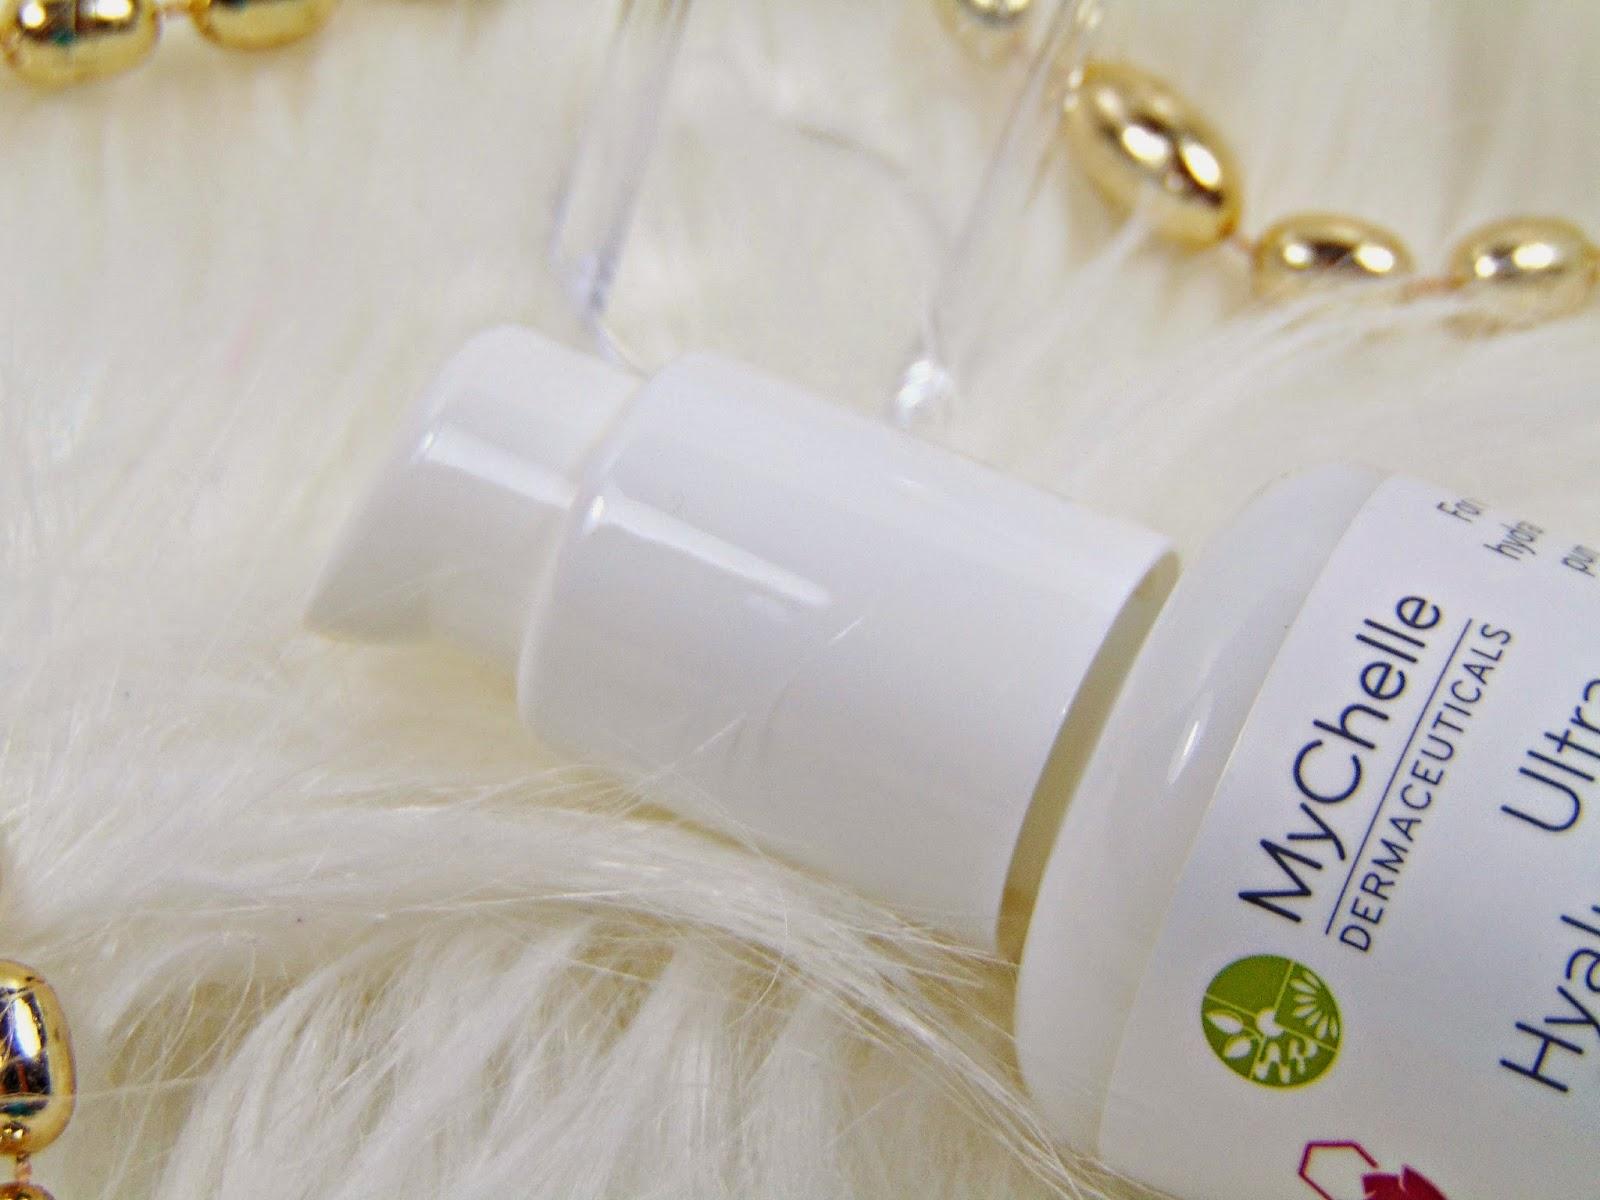 21b9fc5ab41 MyChelle Dermaceuticals Ultra Hyaluronic Hydrating Serum ...